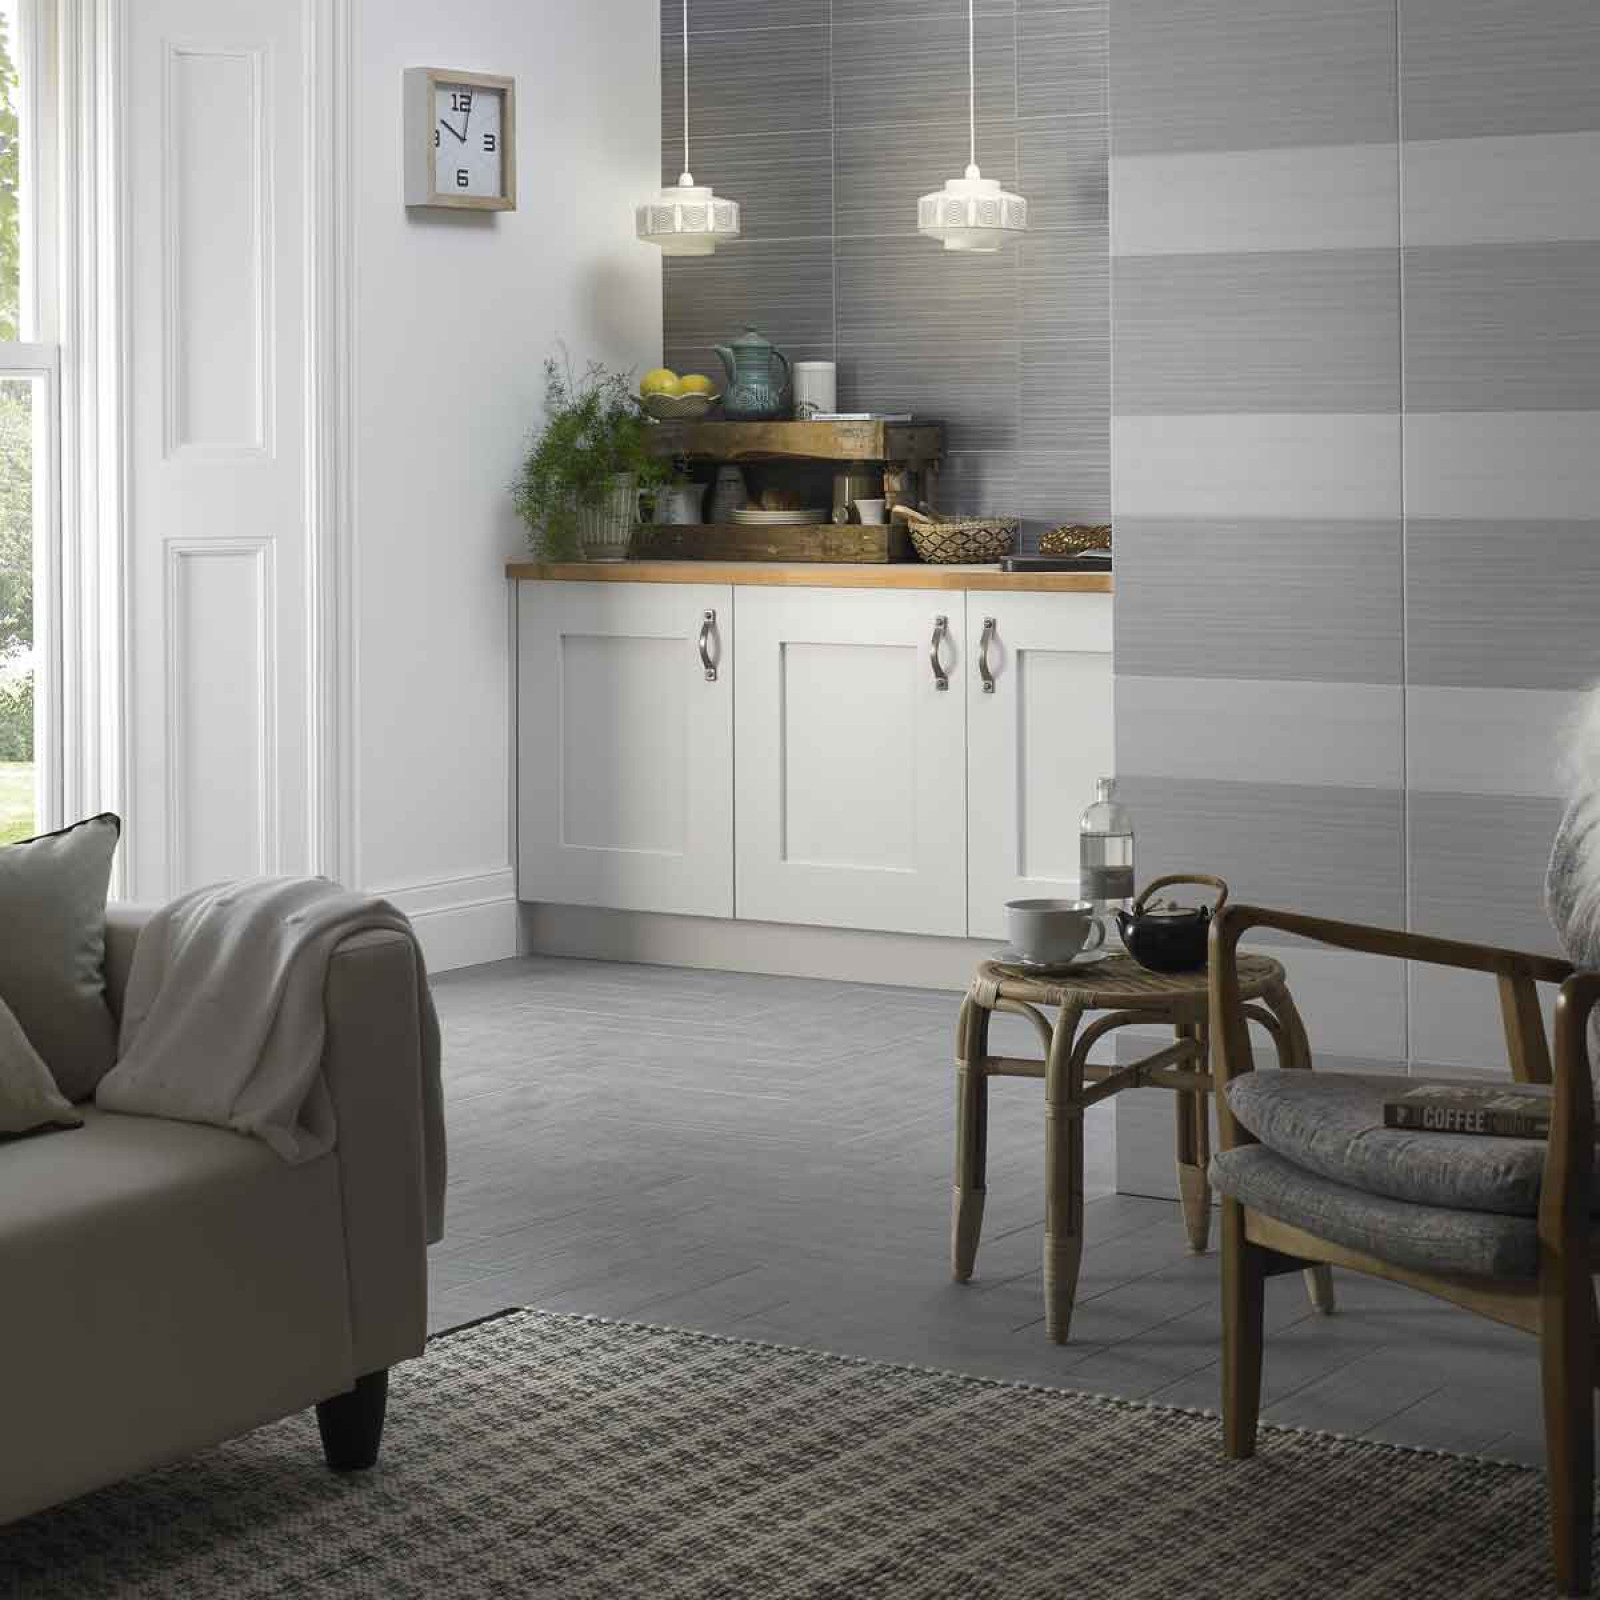 British ceramic tile cloud white matt wall floor british british ceramic tile cloud white matt wall floor british ceramic tile dailygadgetfo Choice Image